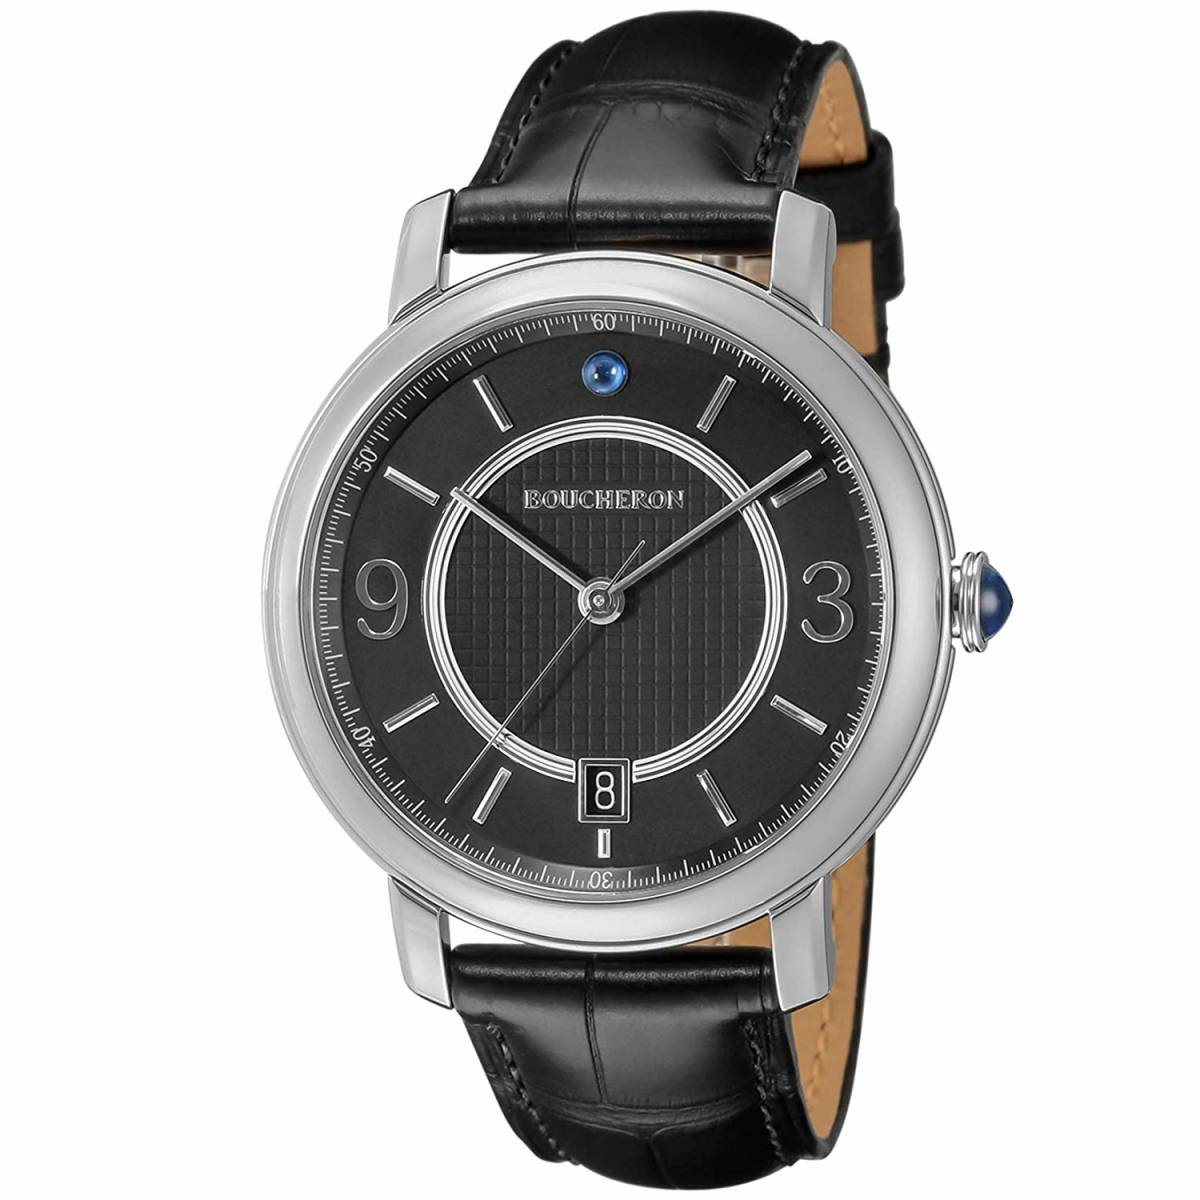 D-1★格安★【新品・訳あり】Boucheron(ブシュロン) 腕時計 エピュール WA021202 並行輸入品 シルバー